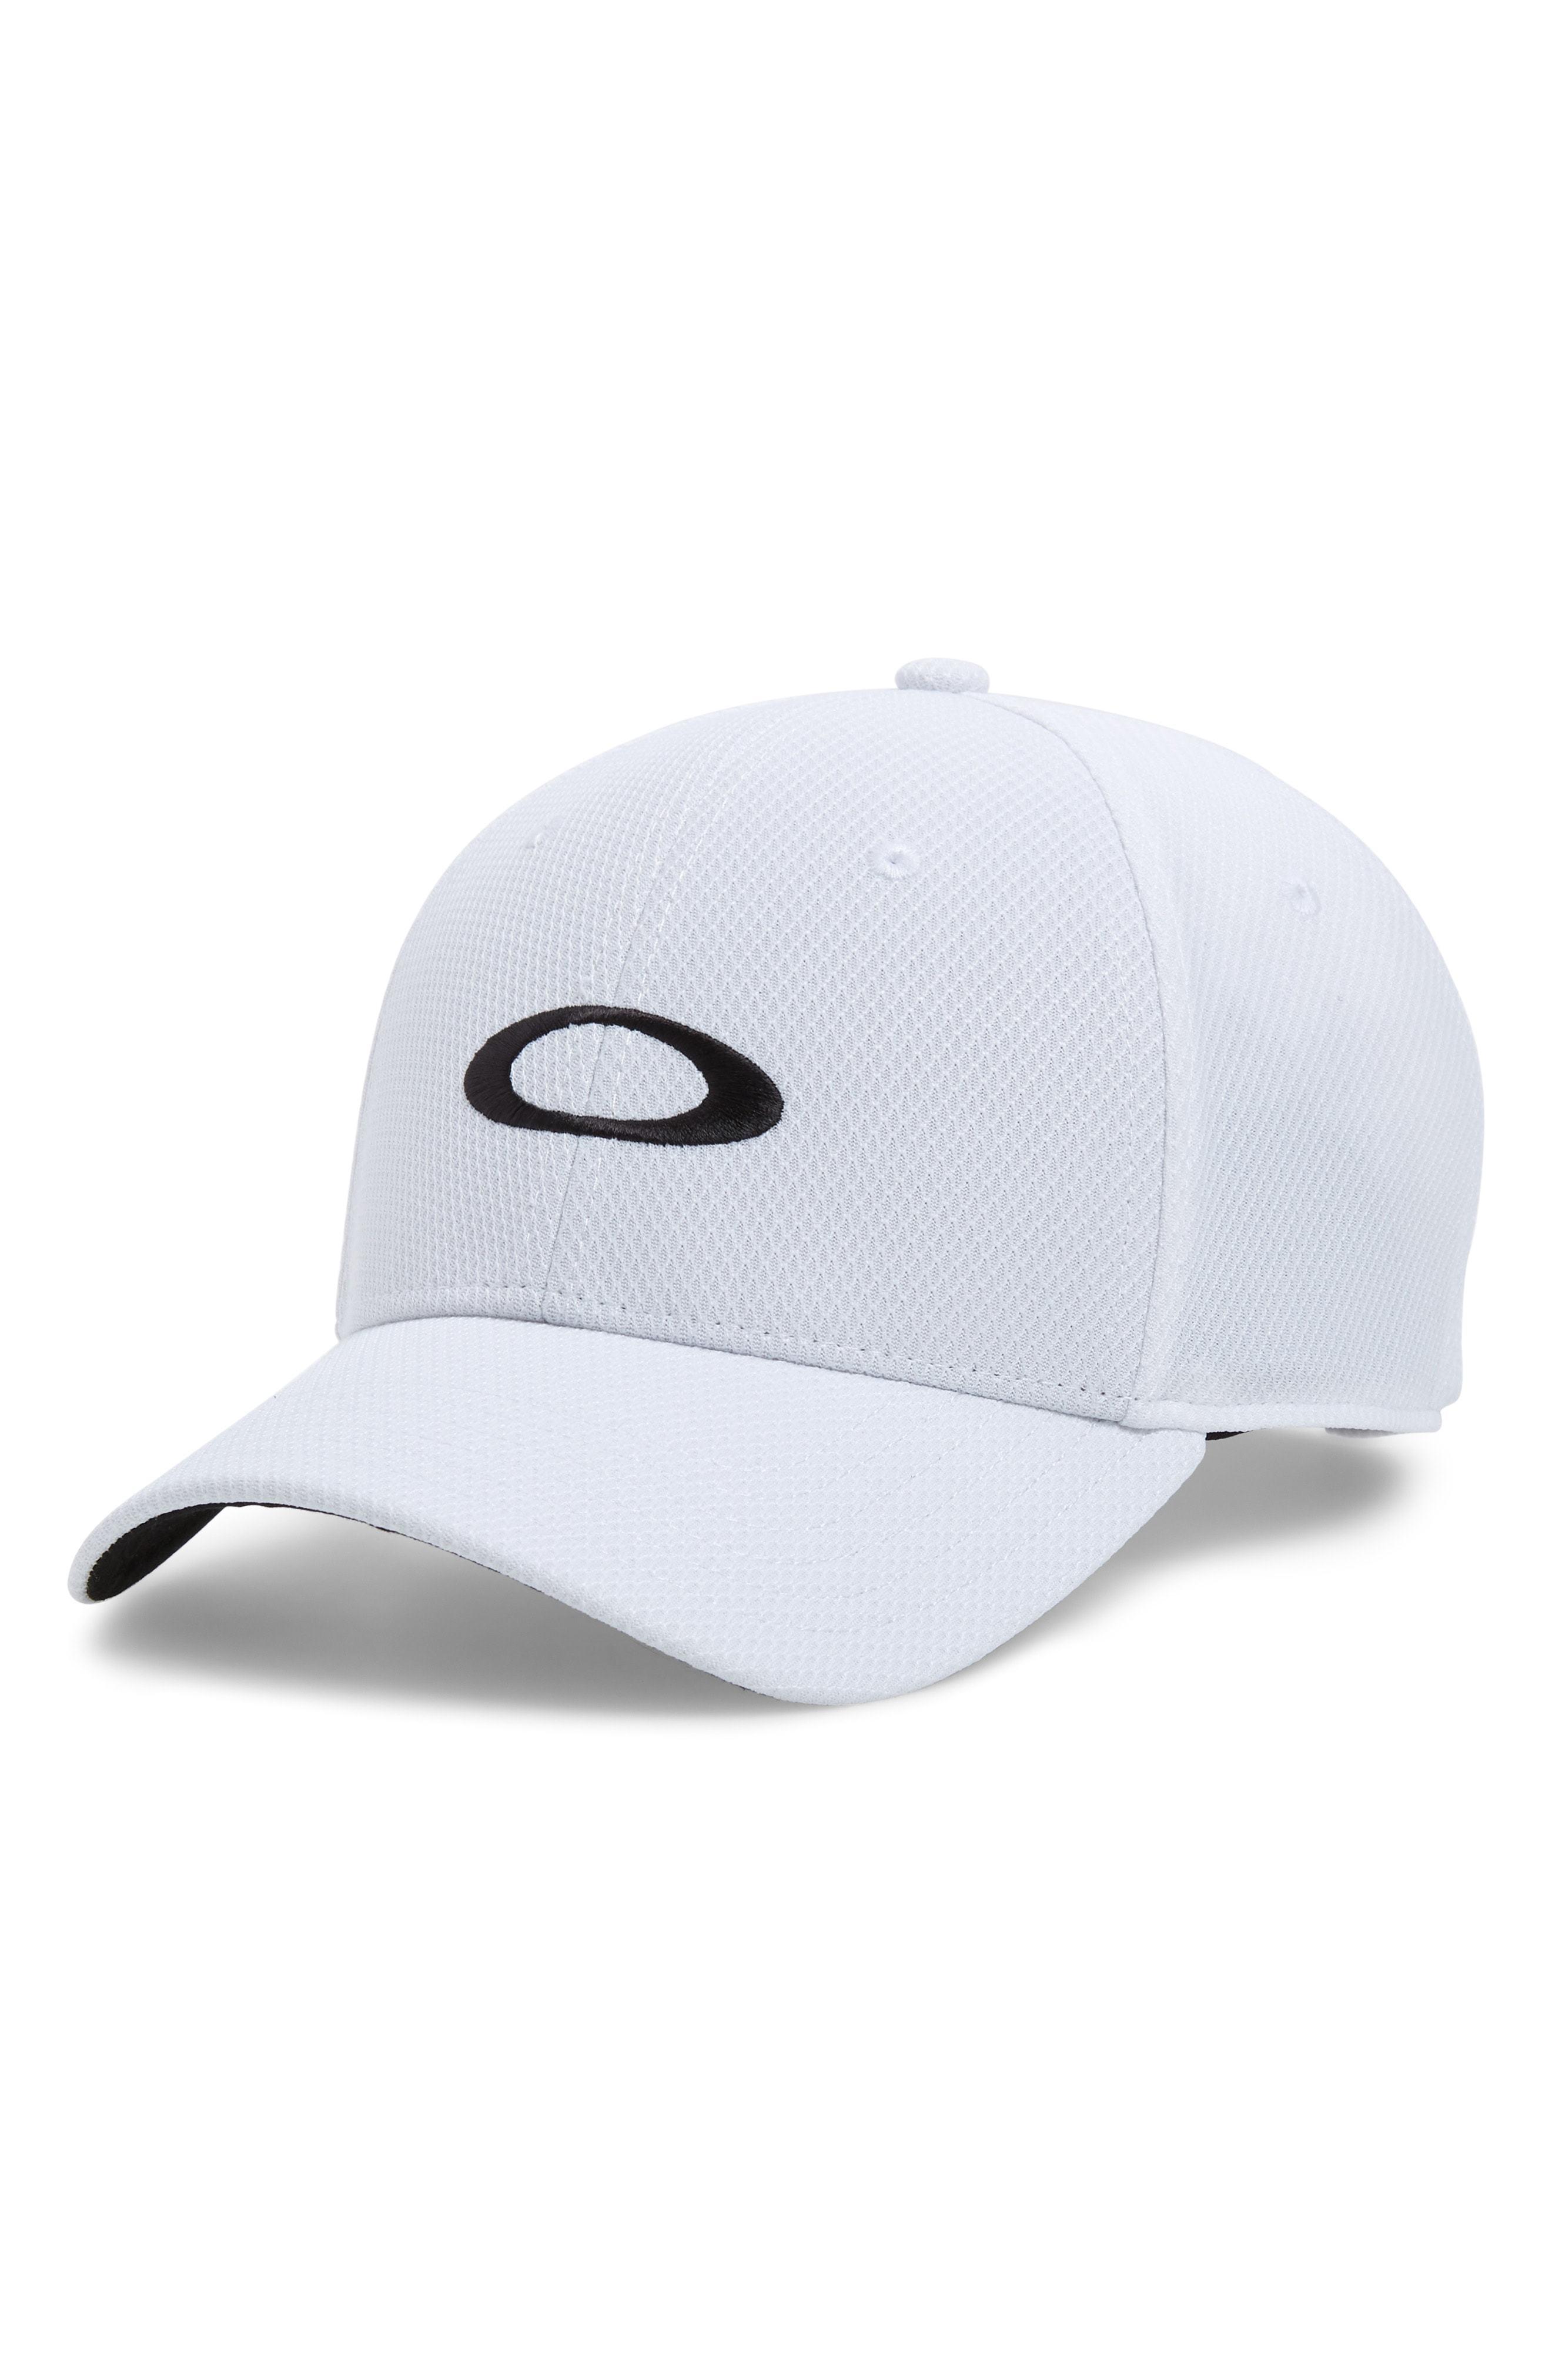 Oakley Golf Ellipse Embroidered Baseball Cap